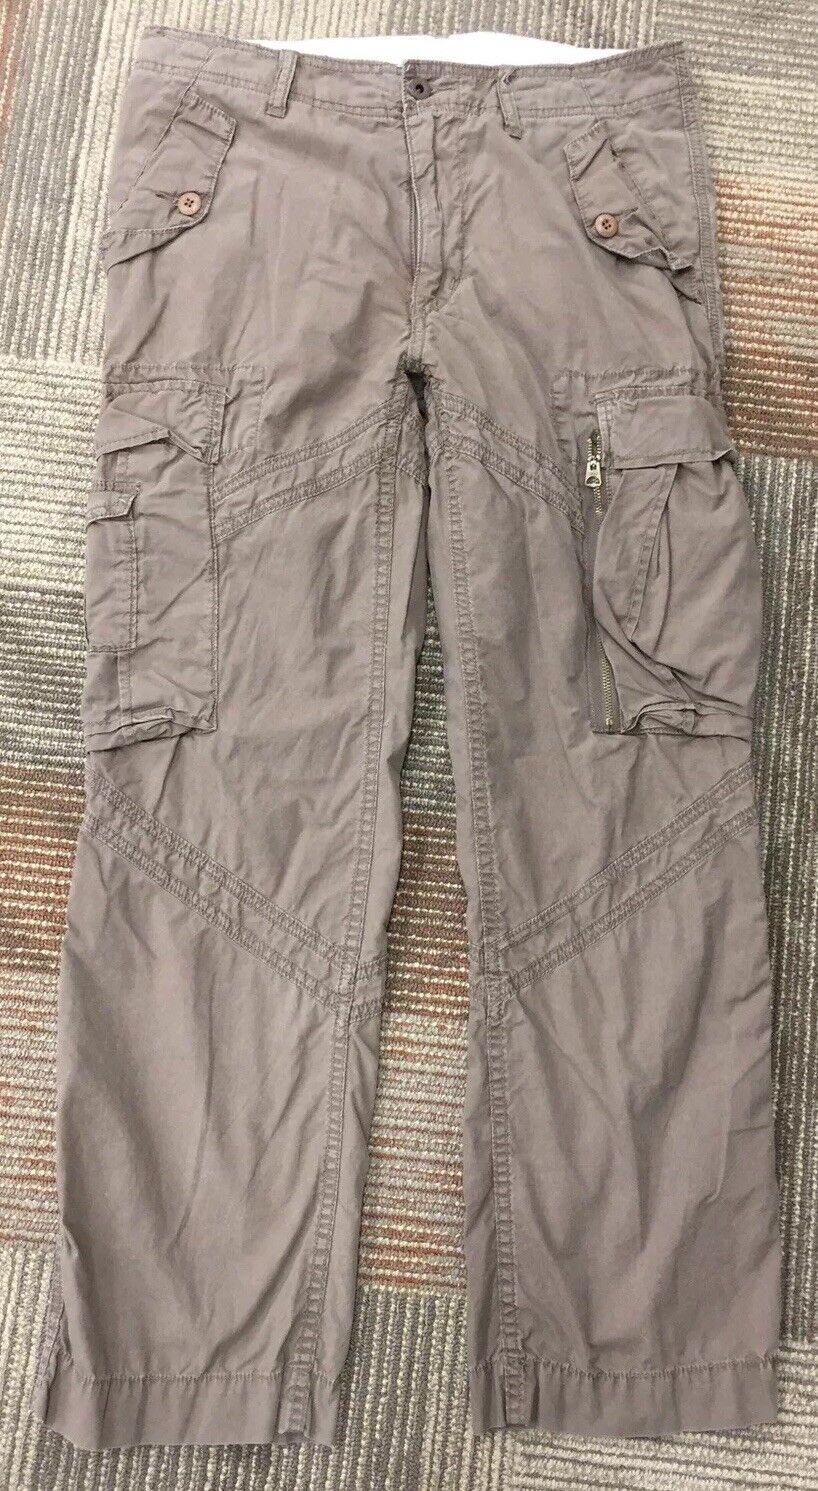 Polo By Ralph Lauren Dark Khaki Cargo Pants Military Men's Size 32 L 30